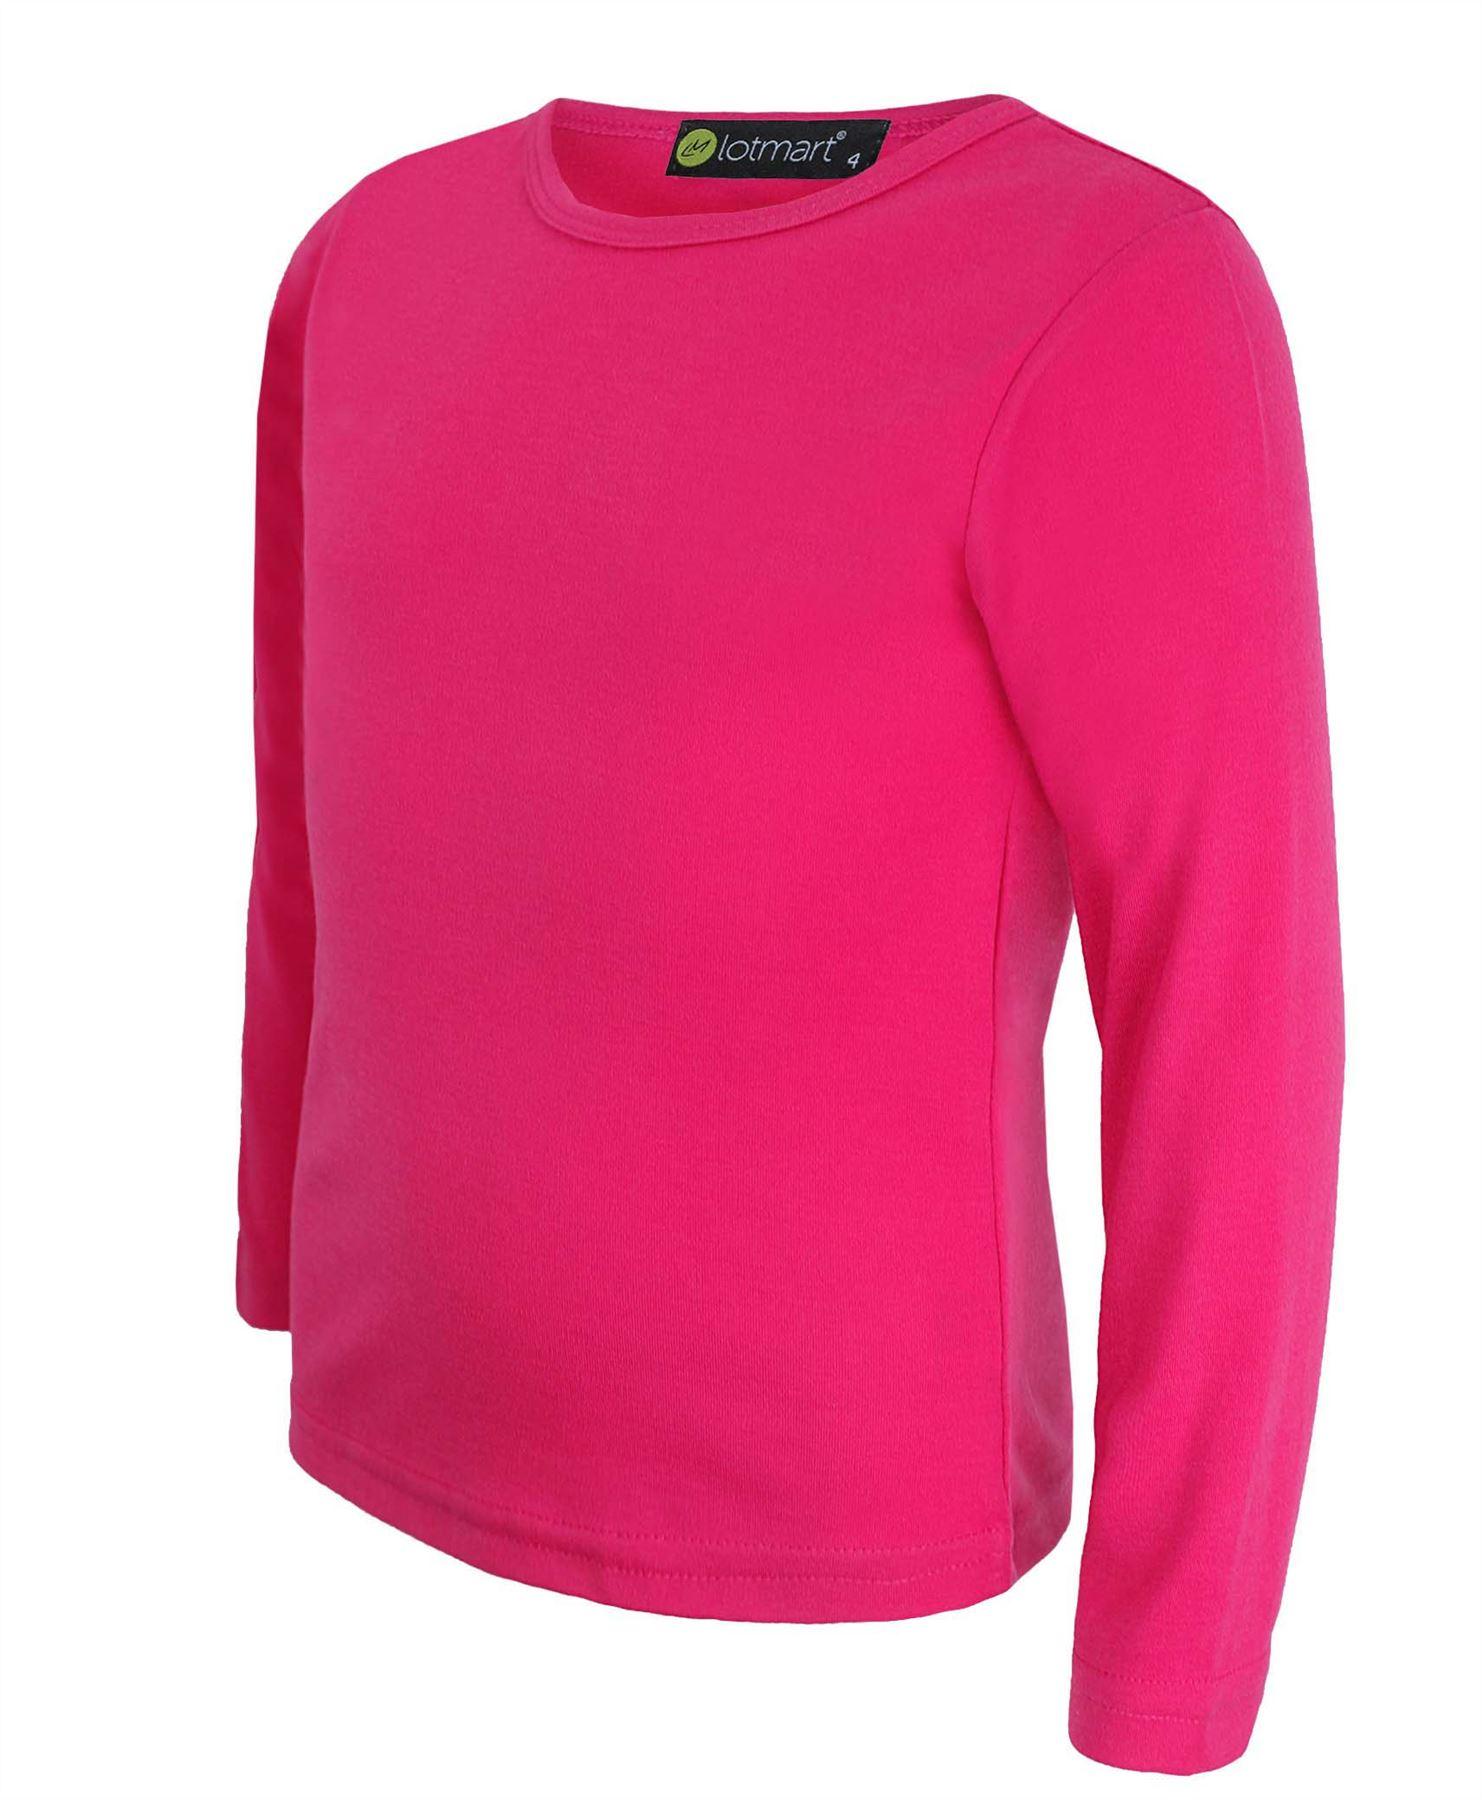 Kids Plain Basic Top Long Sleeve Girls Boys T Shirt Tops